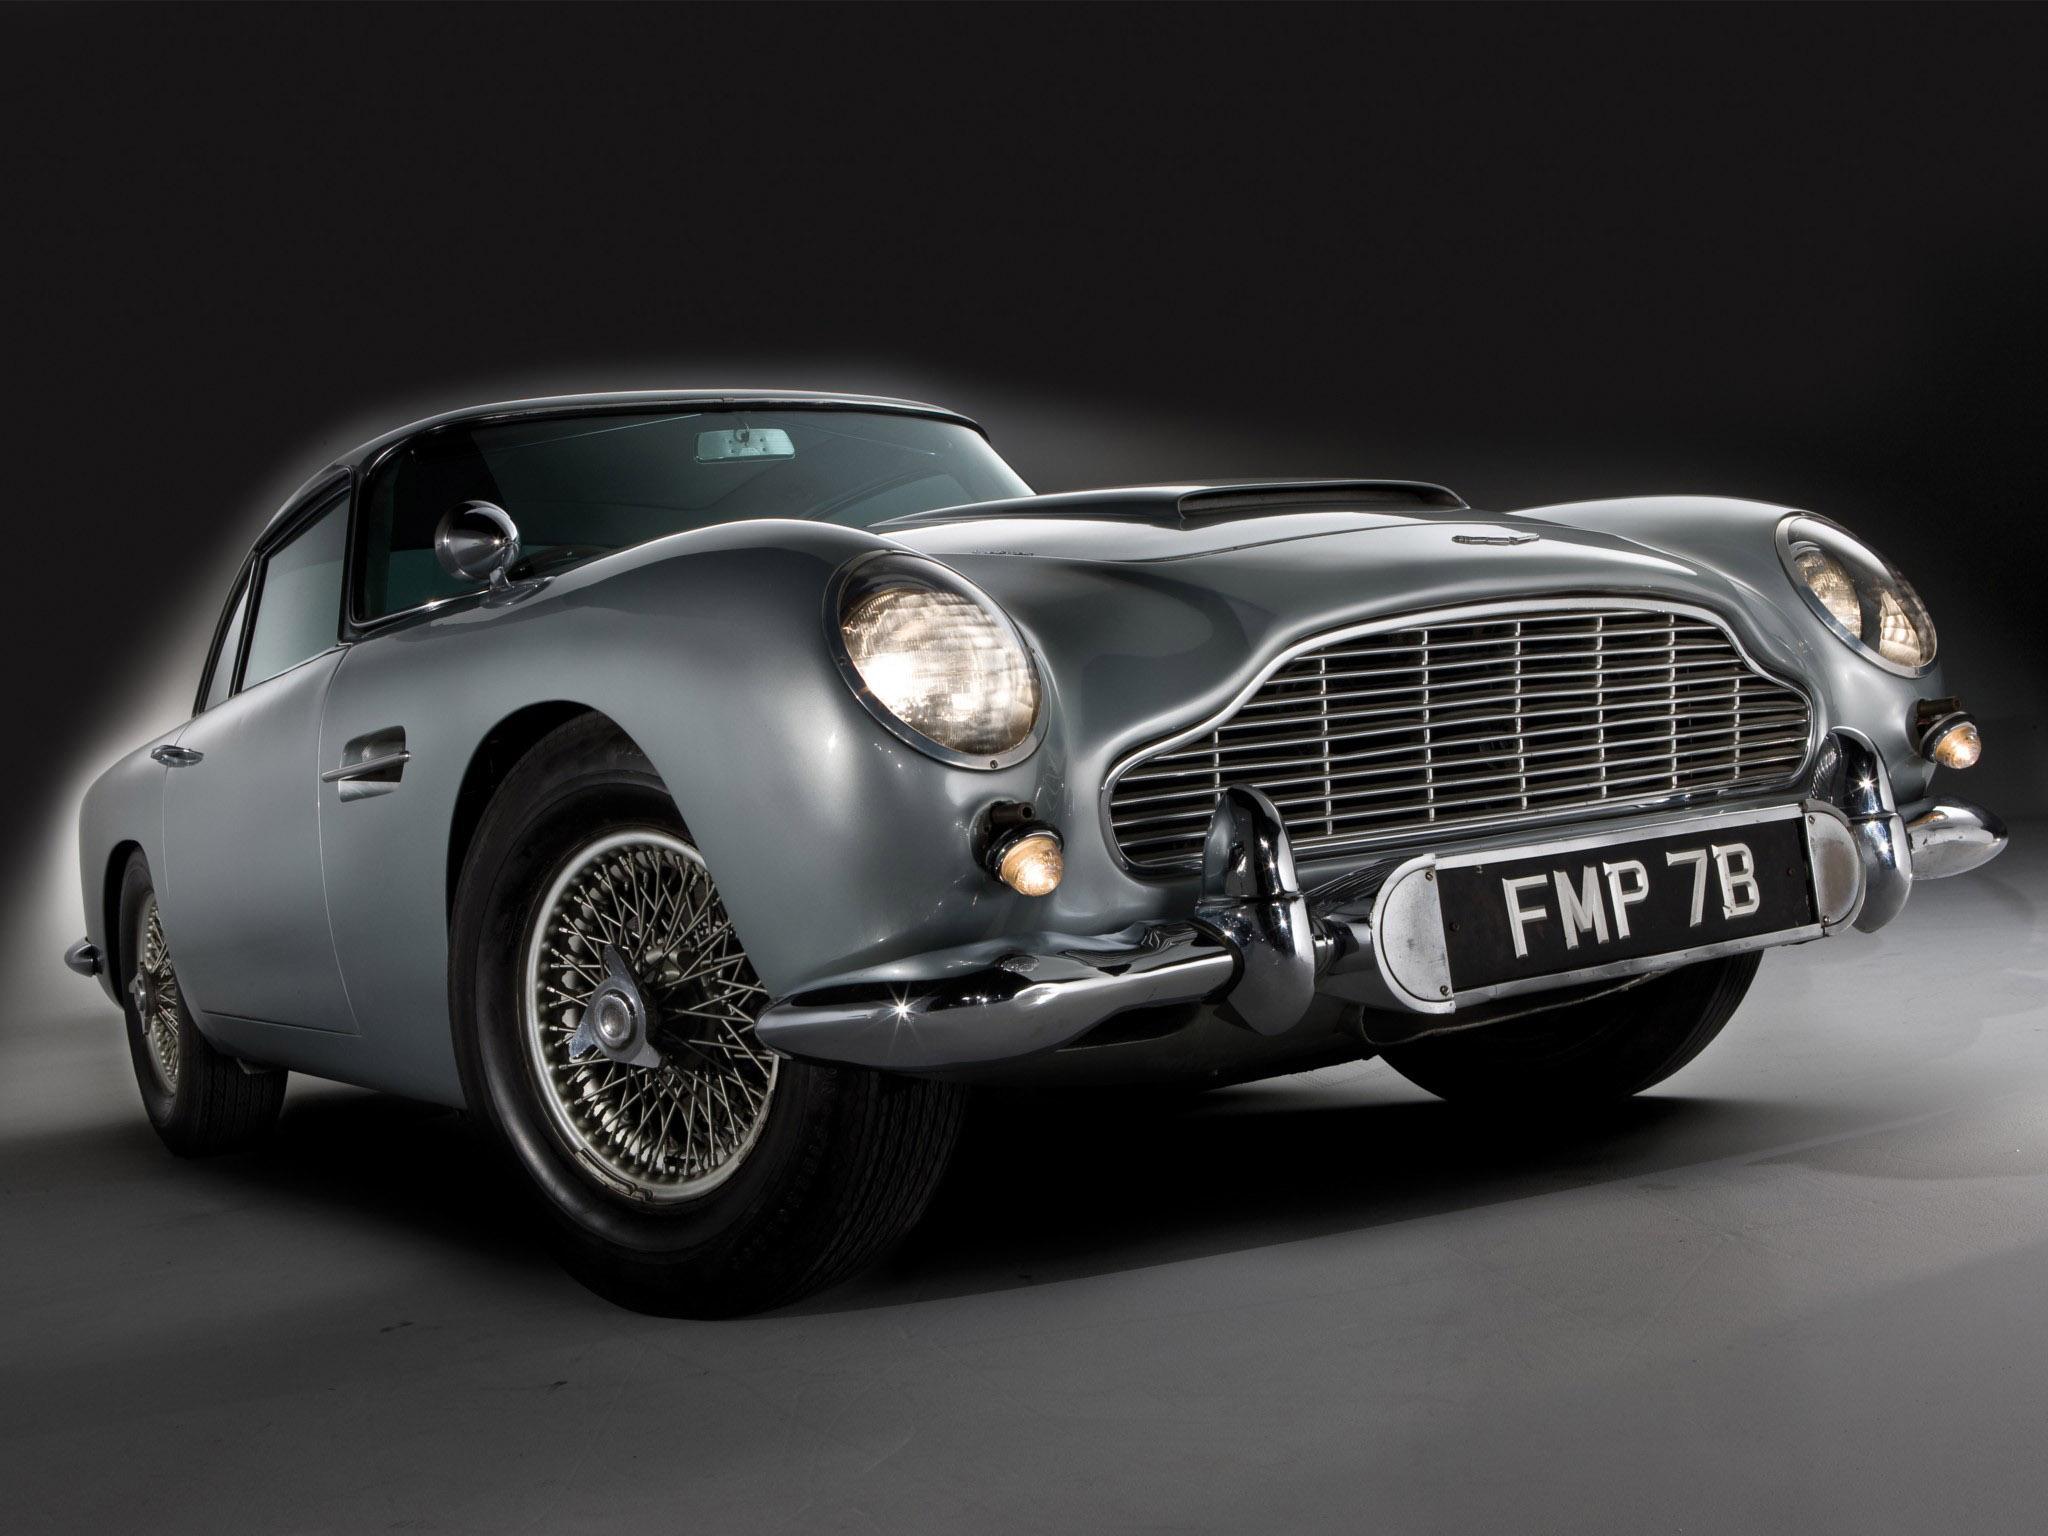 Aston Martin DB5 Wallpaper Image 2048x1536